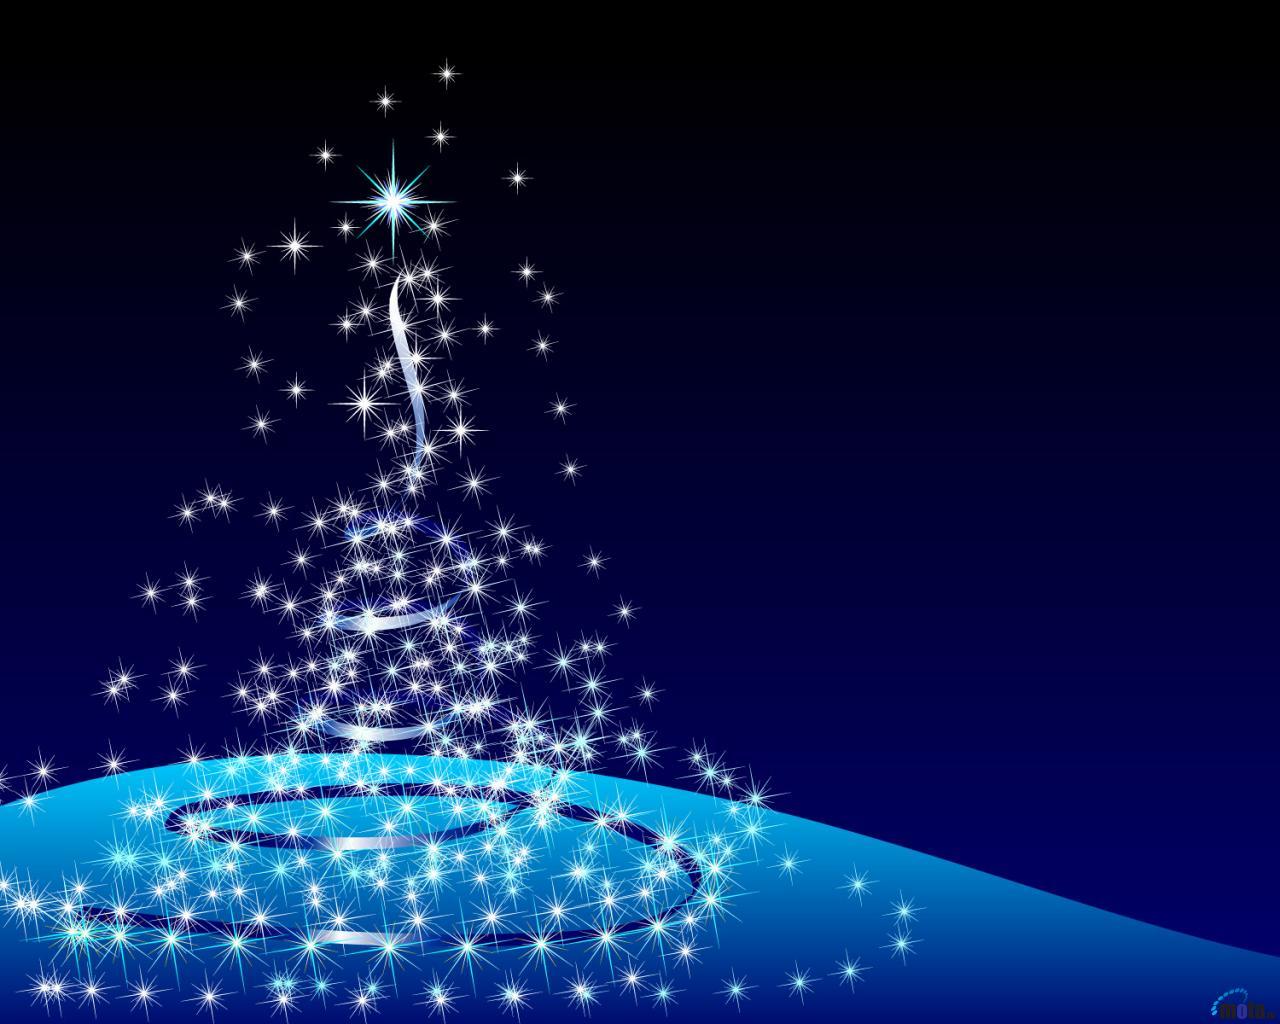 christmas tree desktop wallpaper 1280x1024 - photo #48